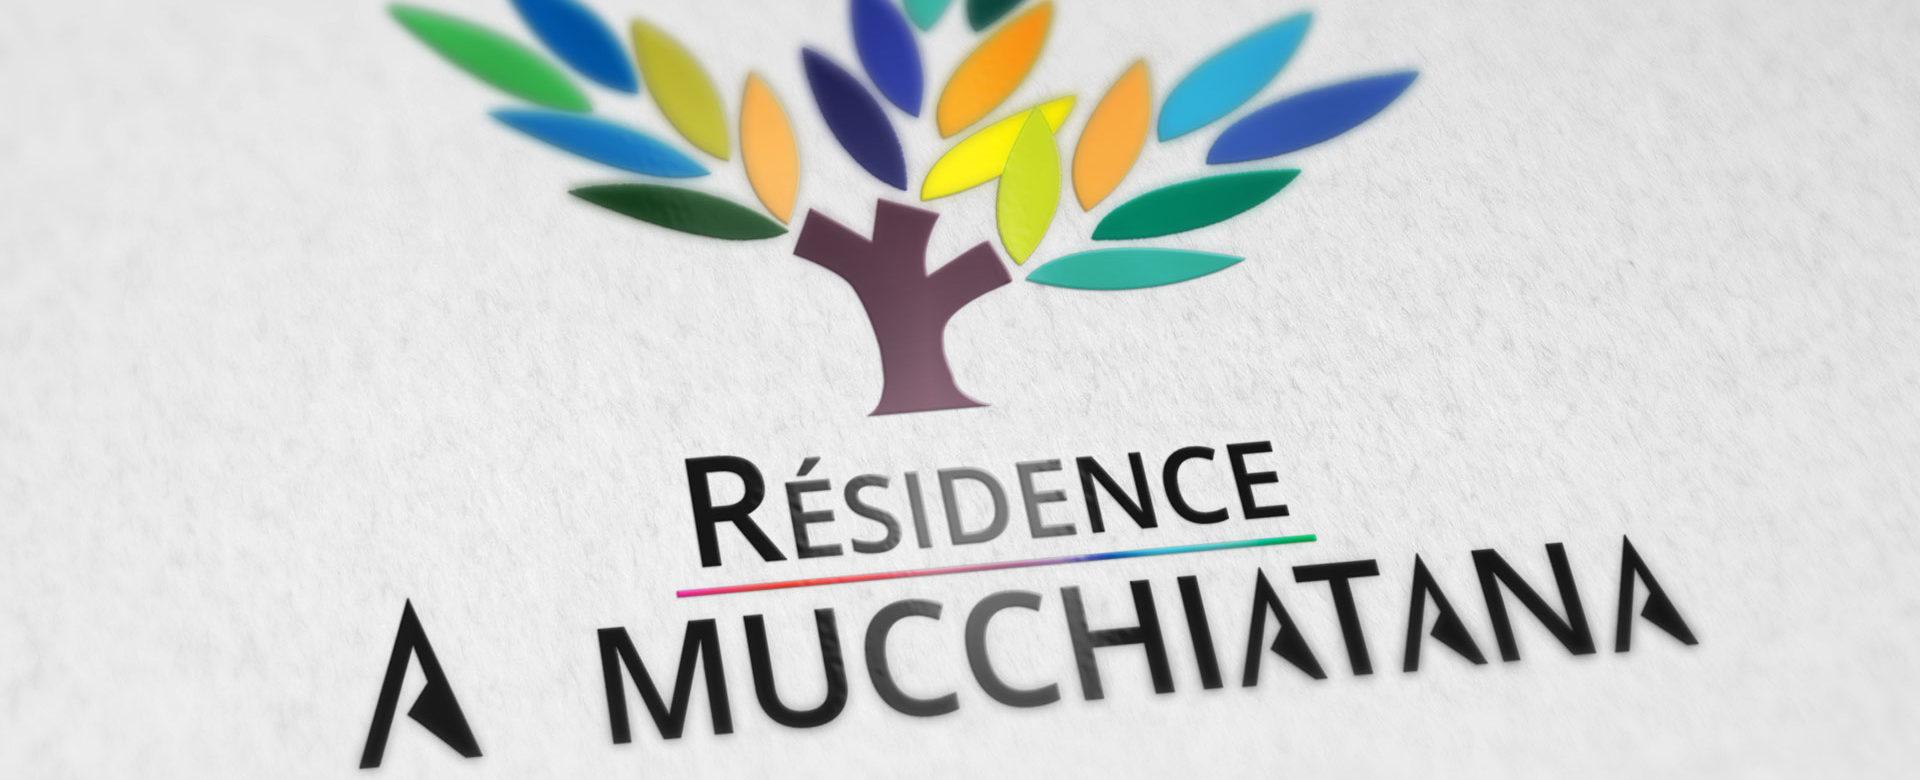 residence-a-mucchiatana-logo